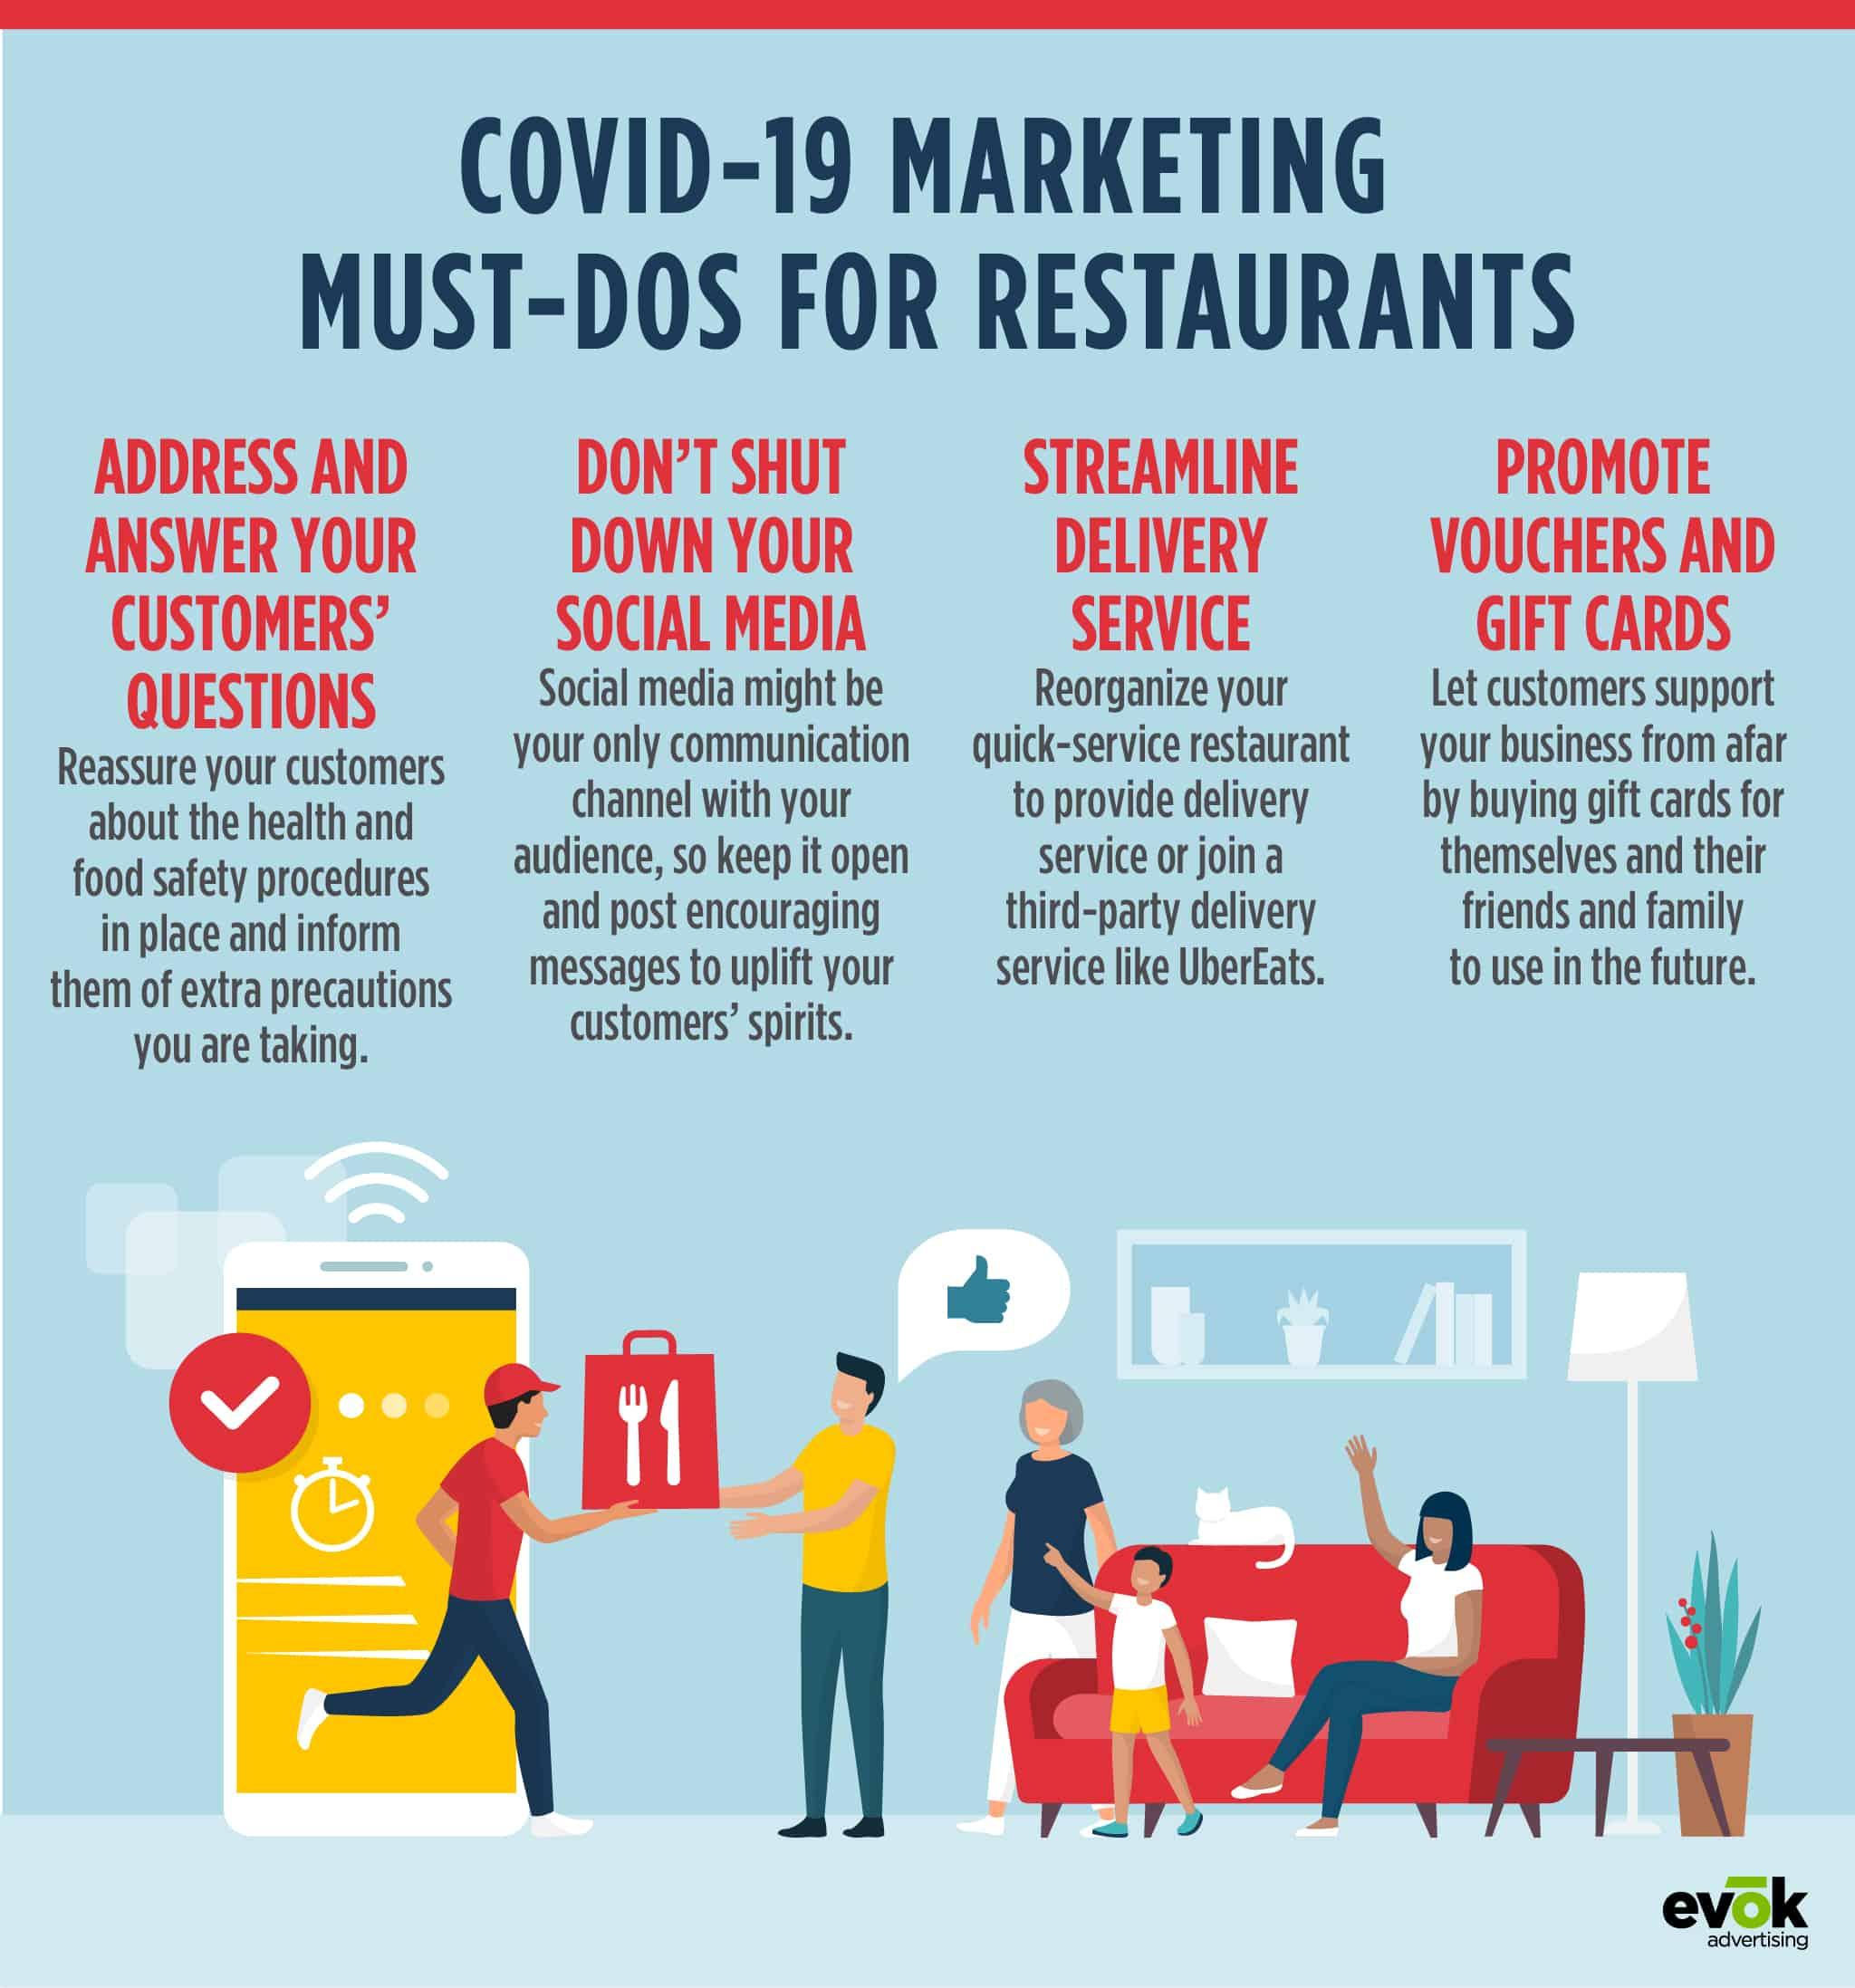 COVID-19 Marketing Must-Dos for Restaurants